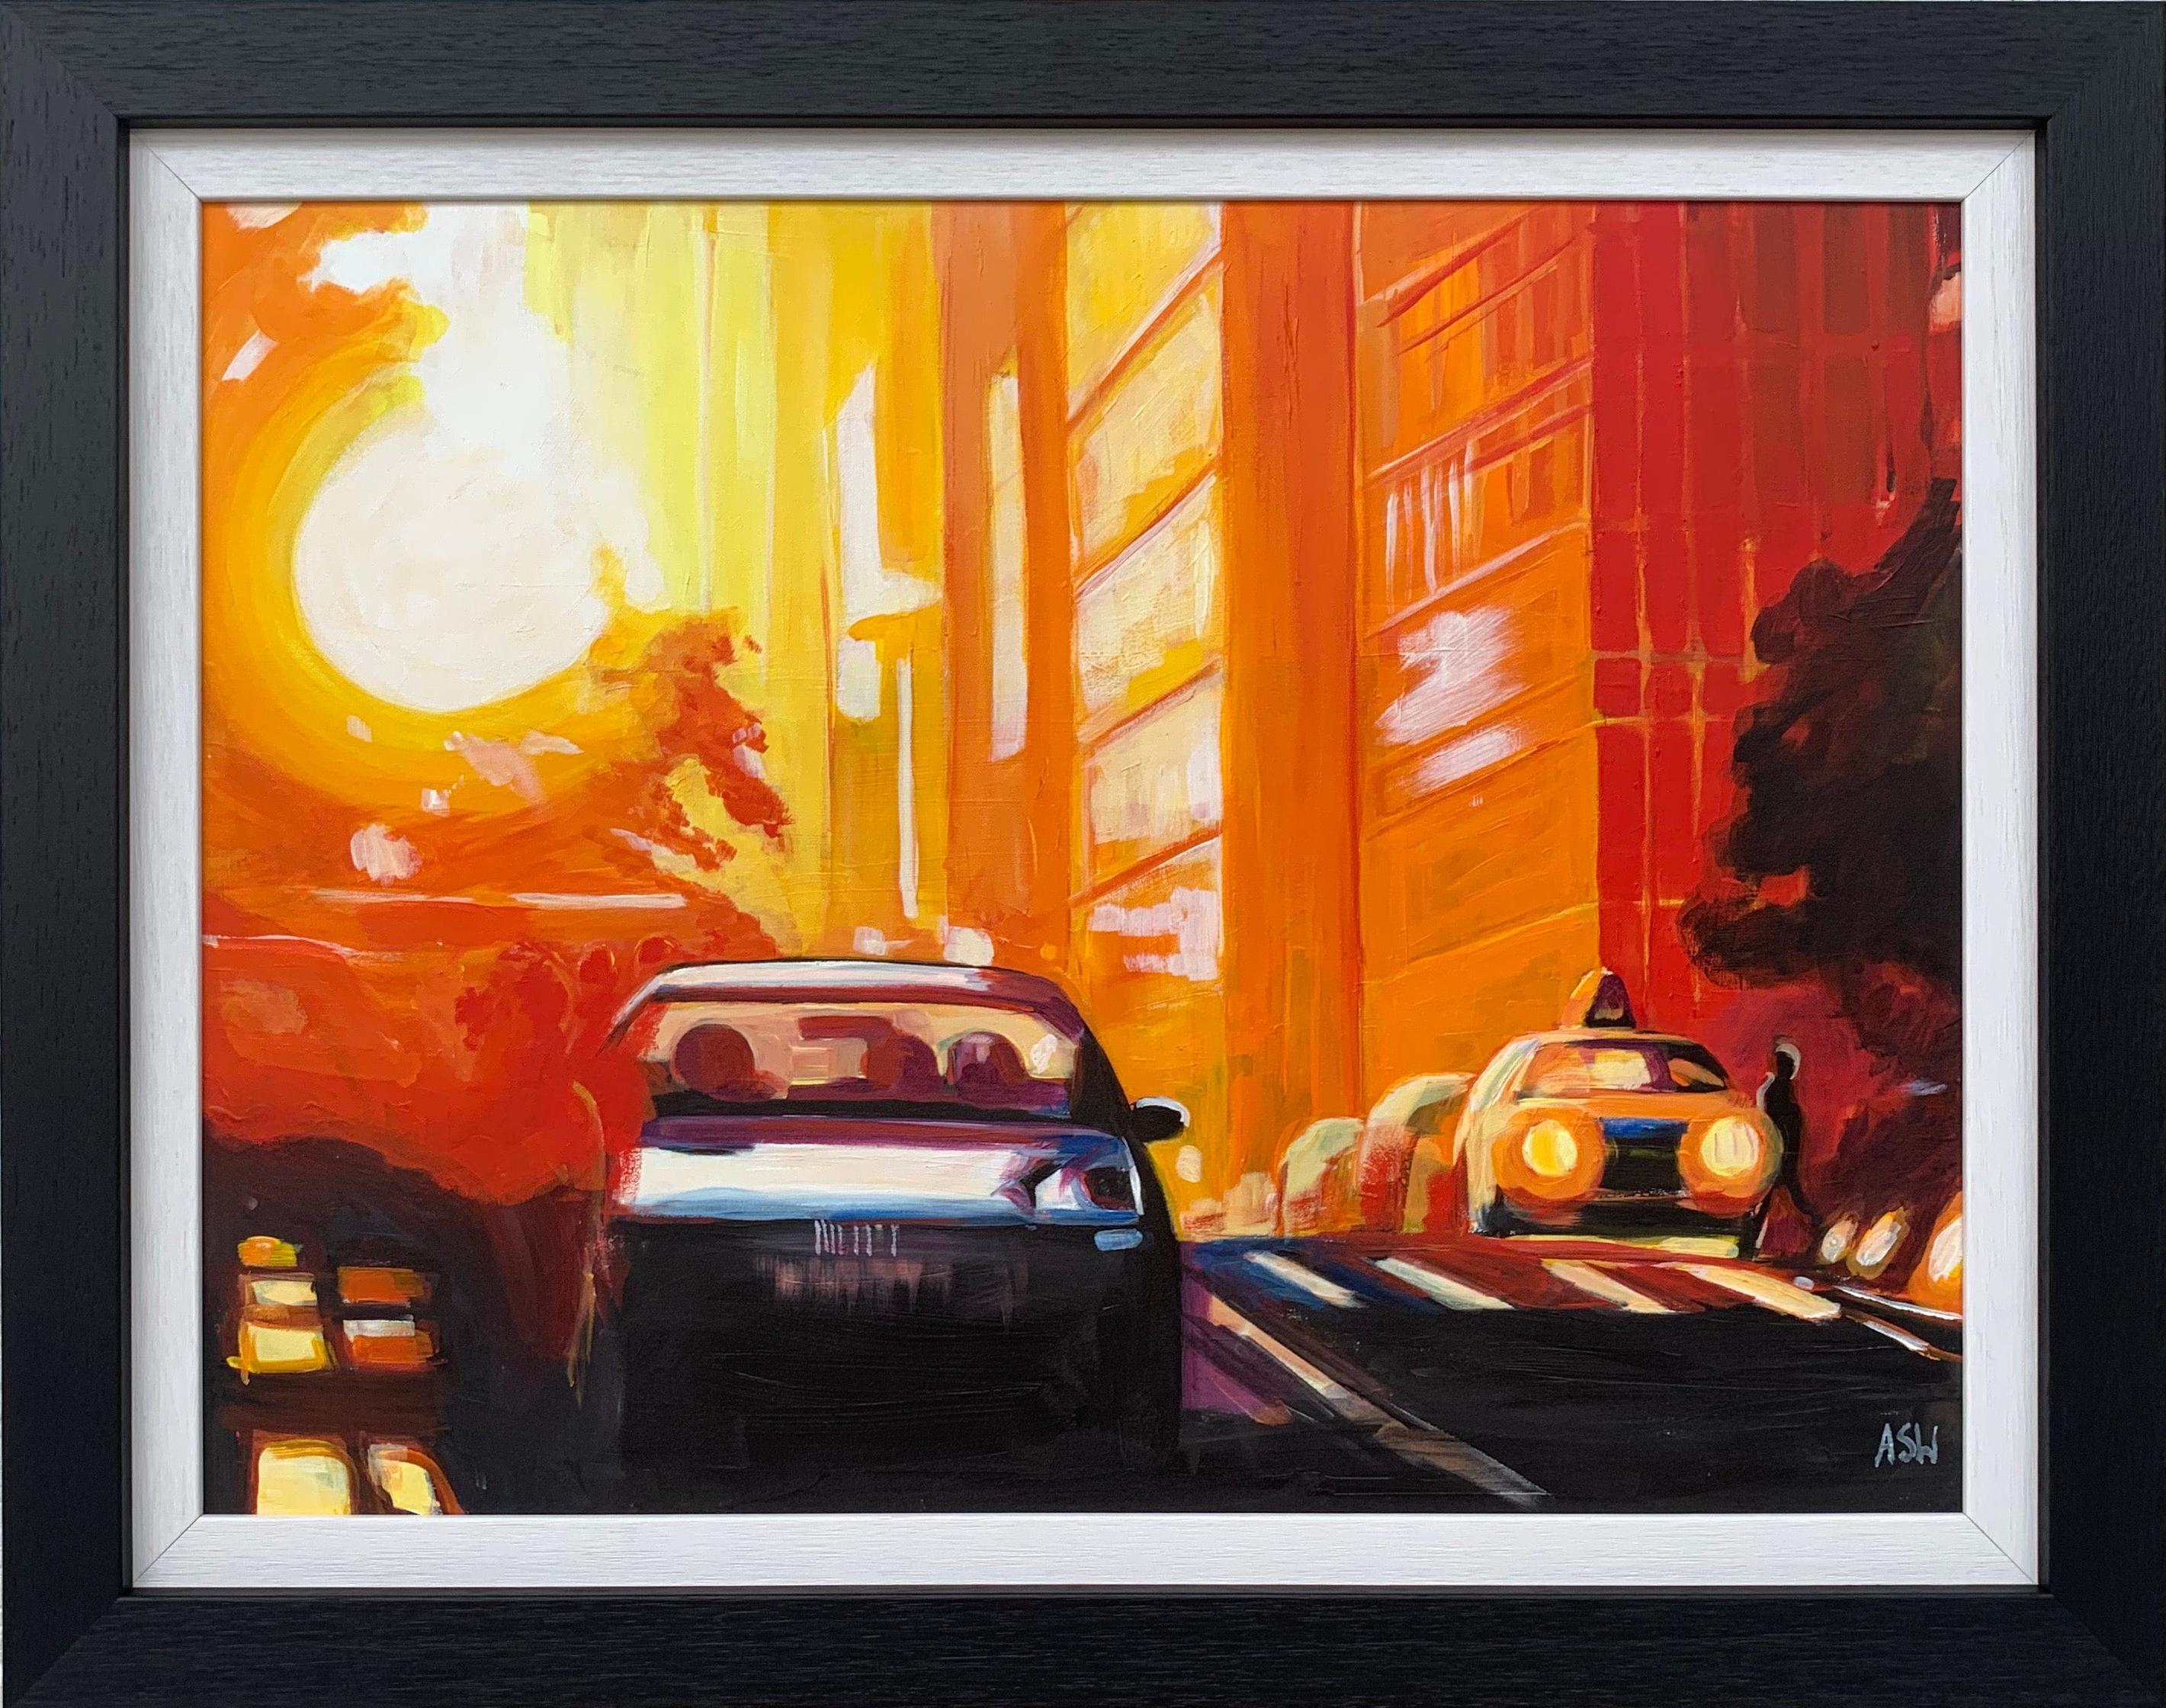 Street Study of Manhattan Henge Sunshine New York City by English Urban Artist